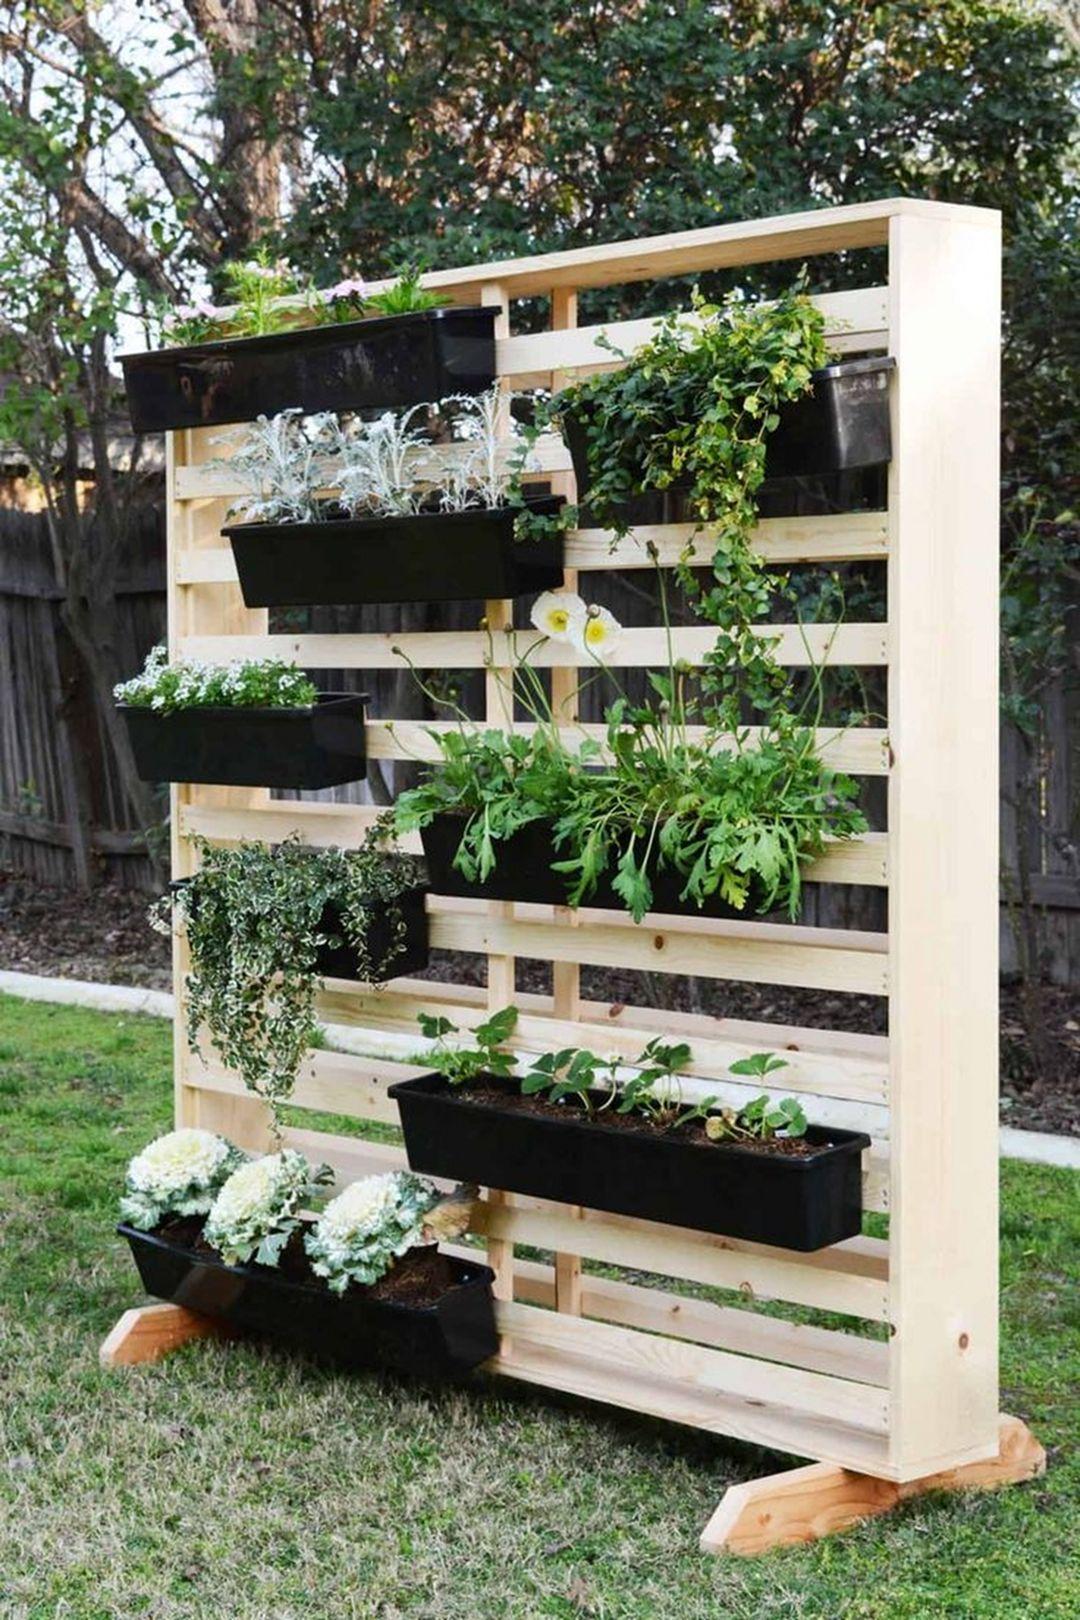 15 Affordable Diy Garden Ideas That Make Your Home Yard Amazing Teracee Vertical Garden Indoor Vertical Garden Diy Vertical Garden